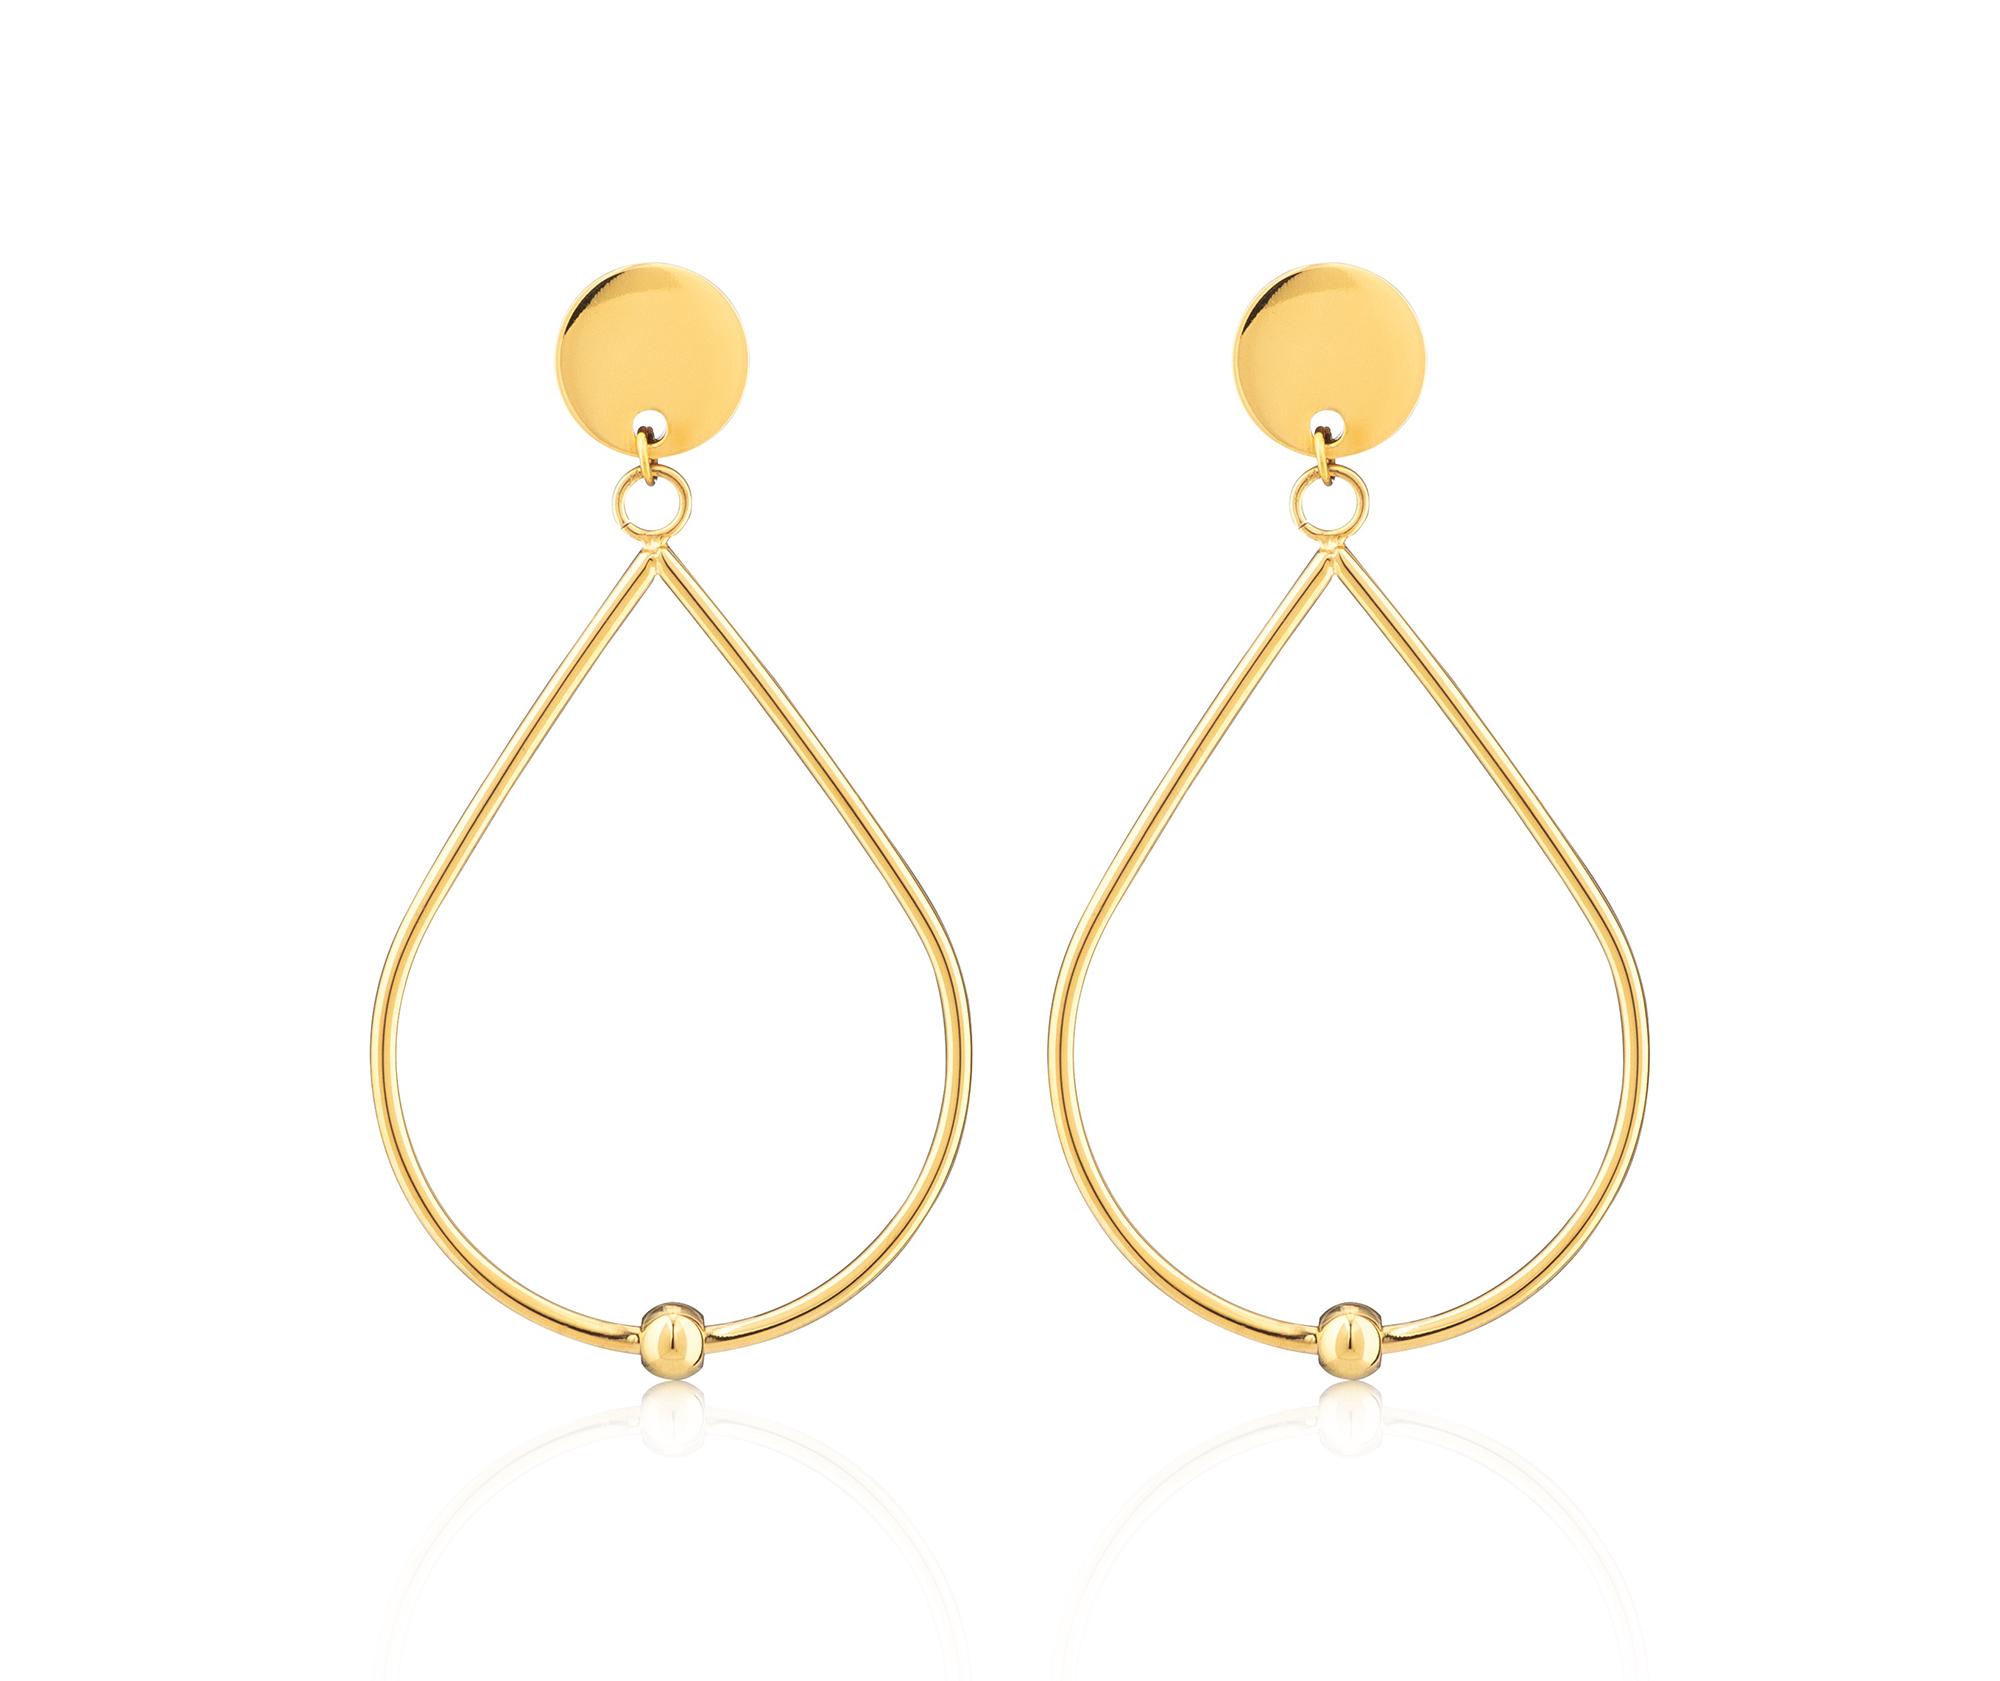 Tinilux,-A-Drop-in-the-Ocean-Earrings - Date night!